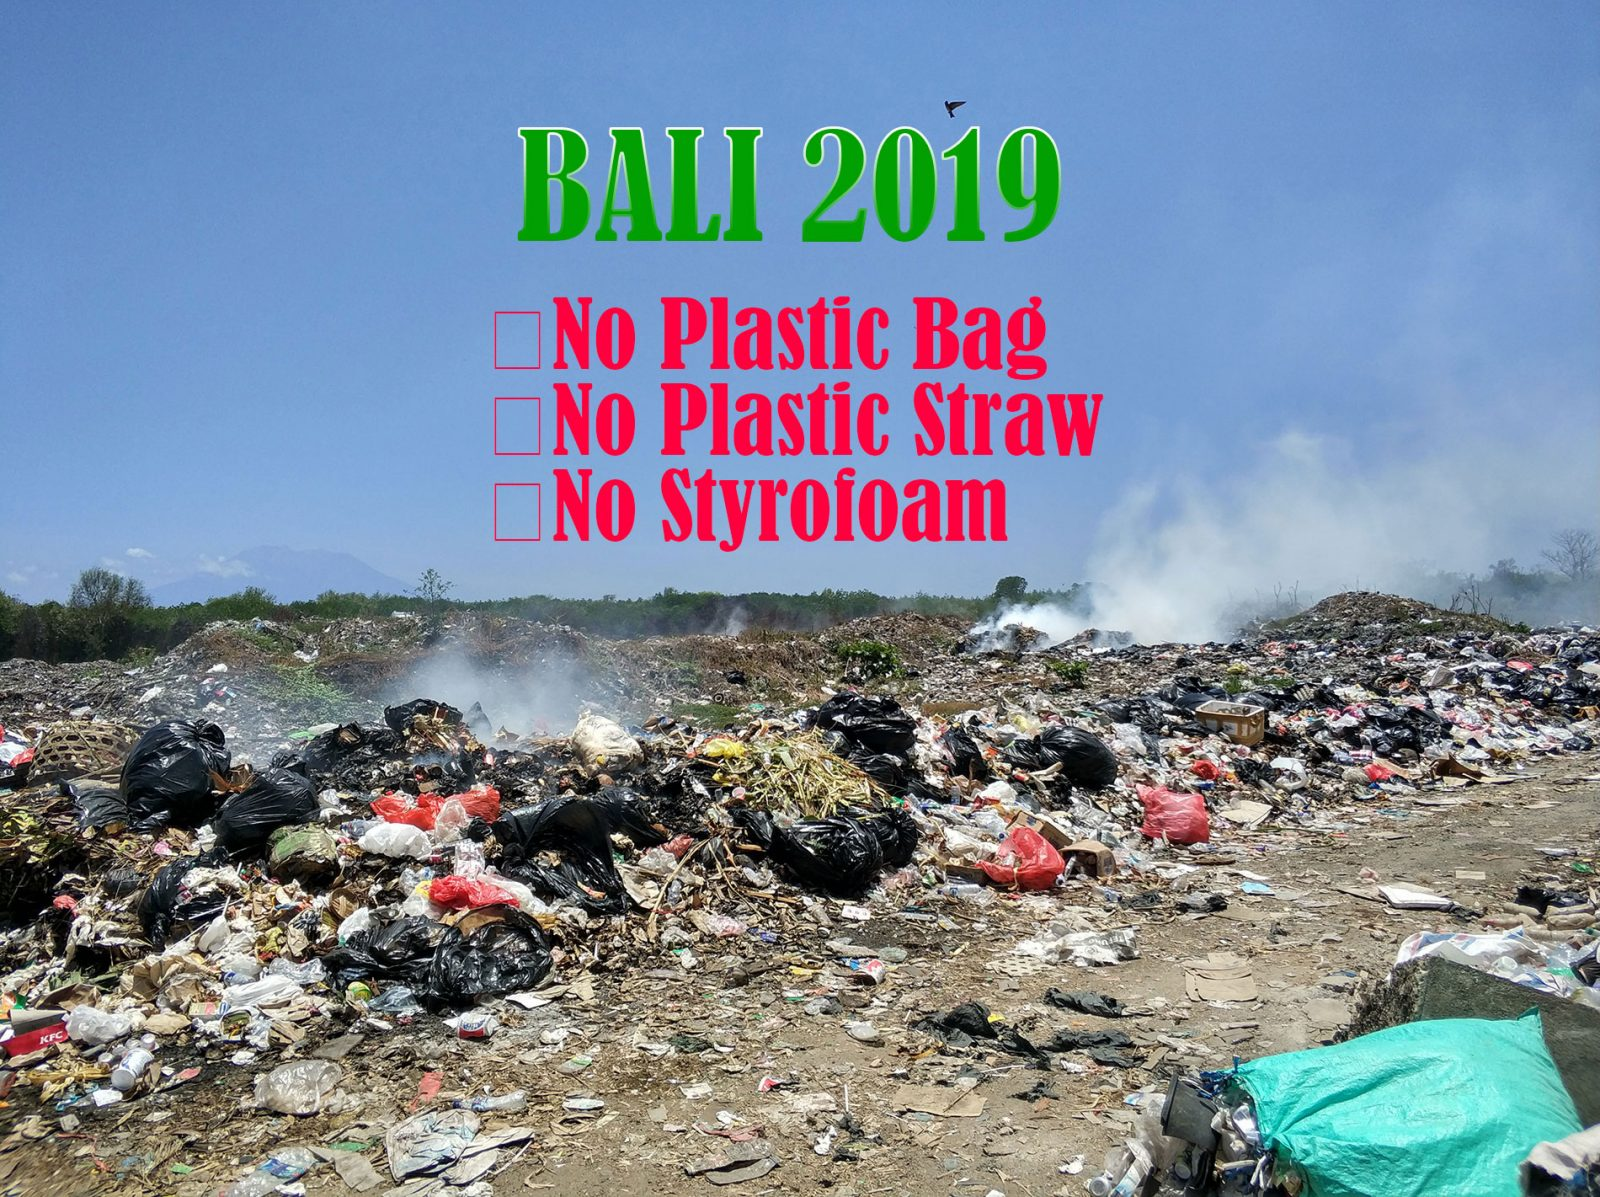 plastic-ban-bali2019